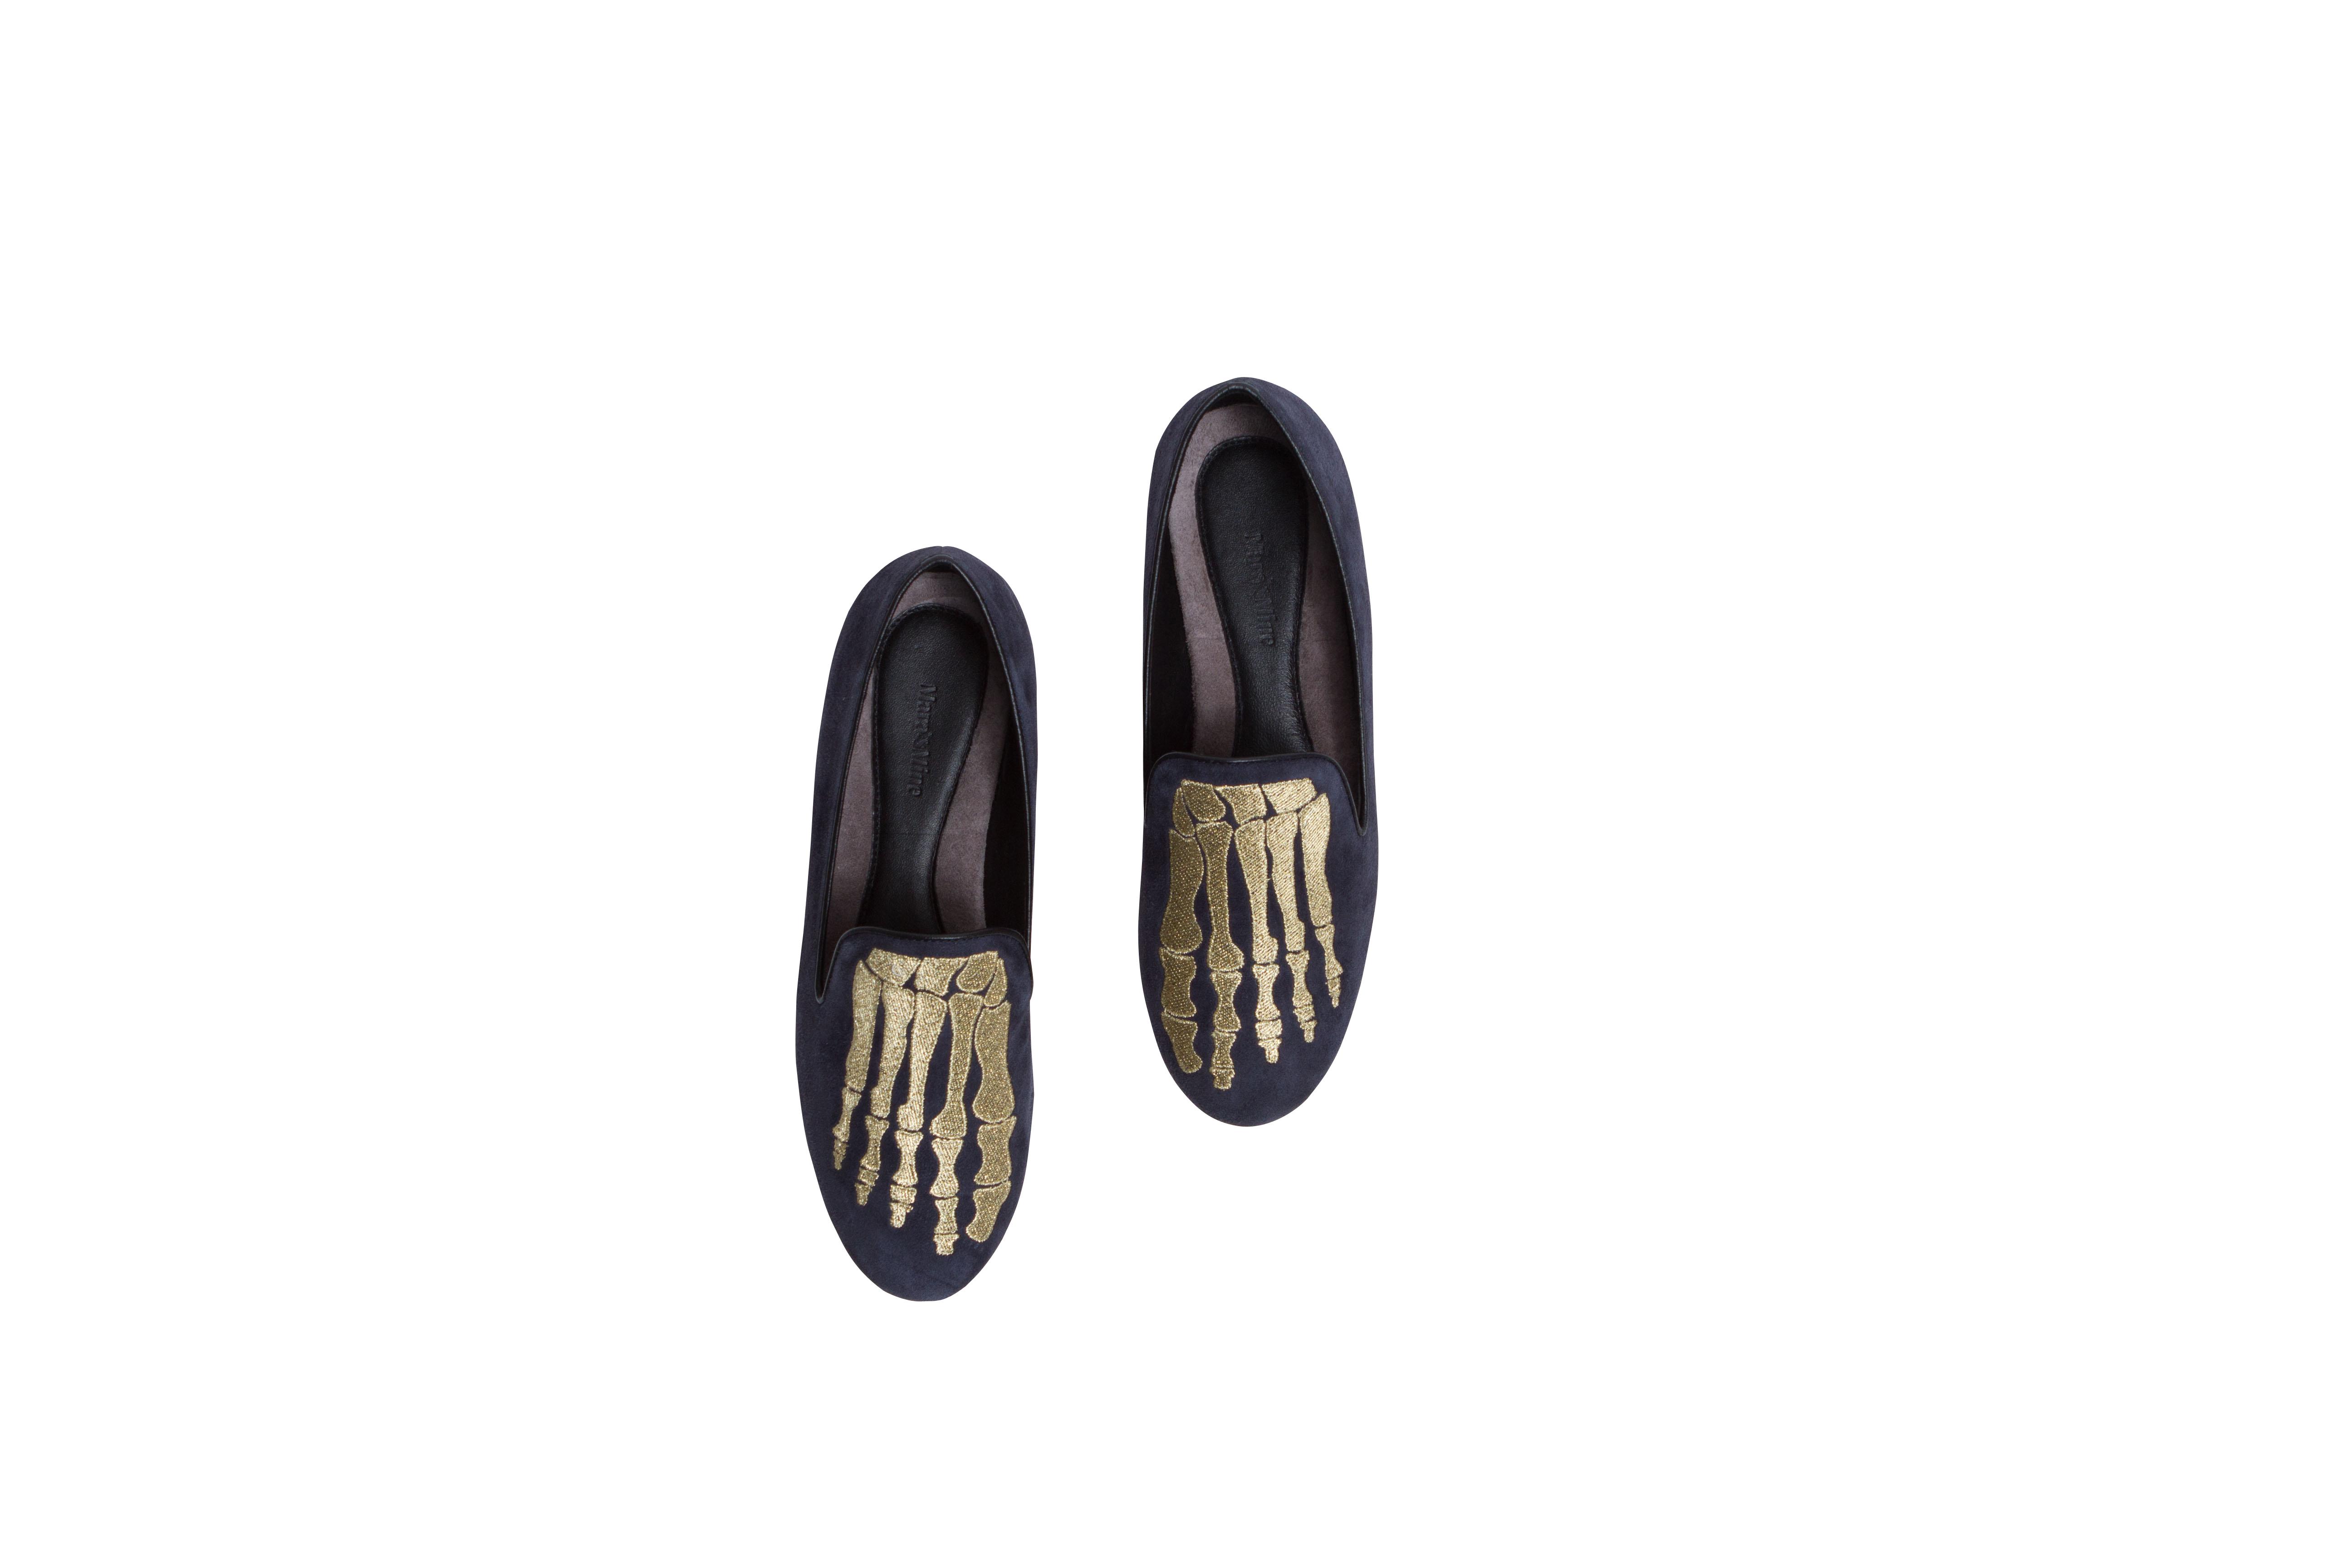 Jem Skull Slipper - Charcoal & Gold - Mara and Mine